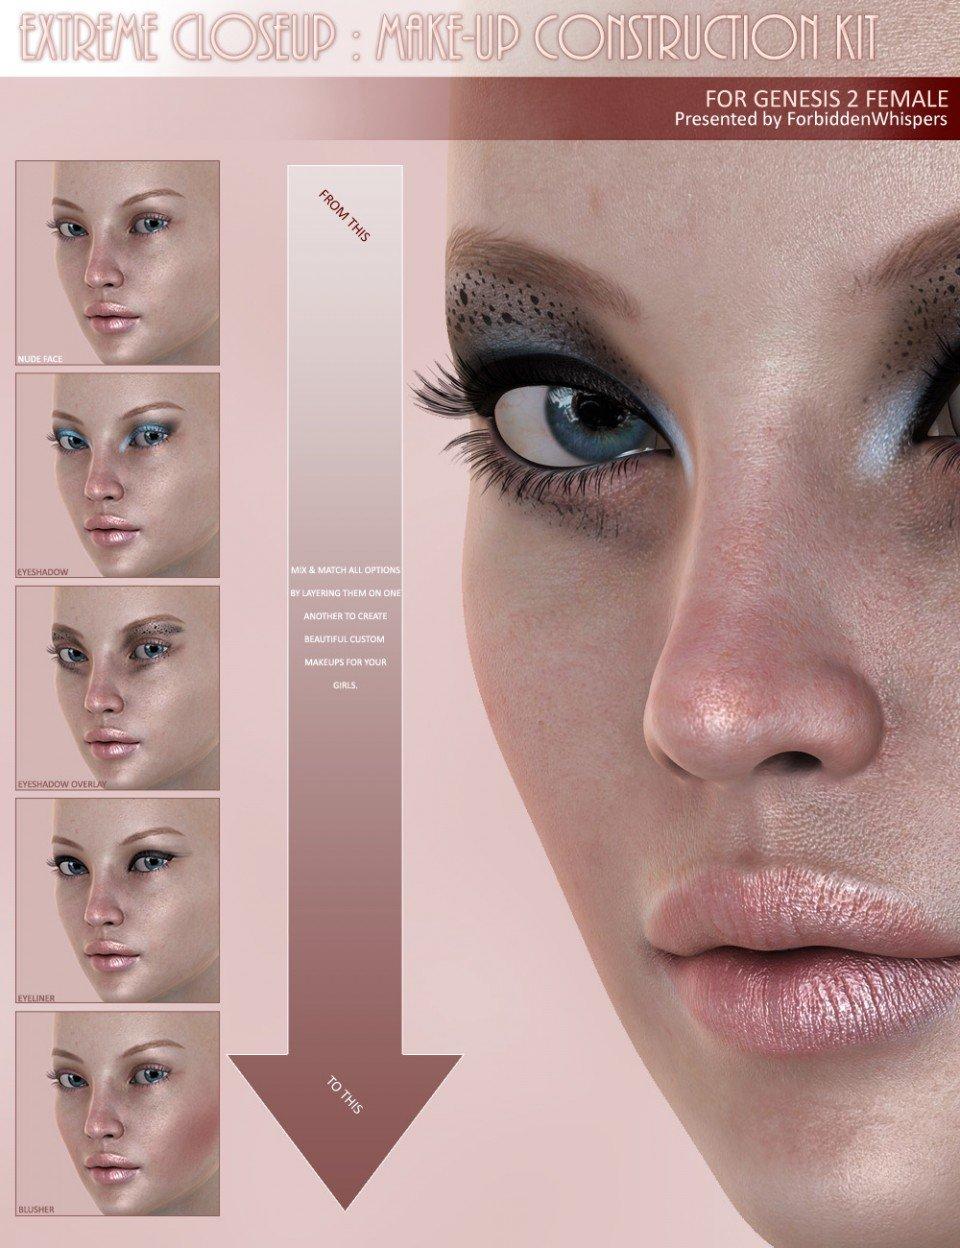 Extreme Closeup: Makeup for Genesis 2 Female(s)_DAZ3D下载站